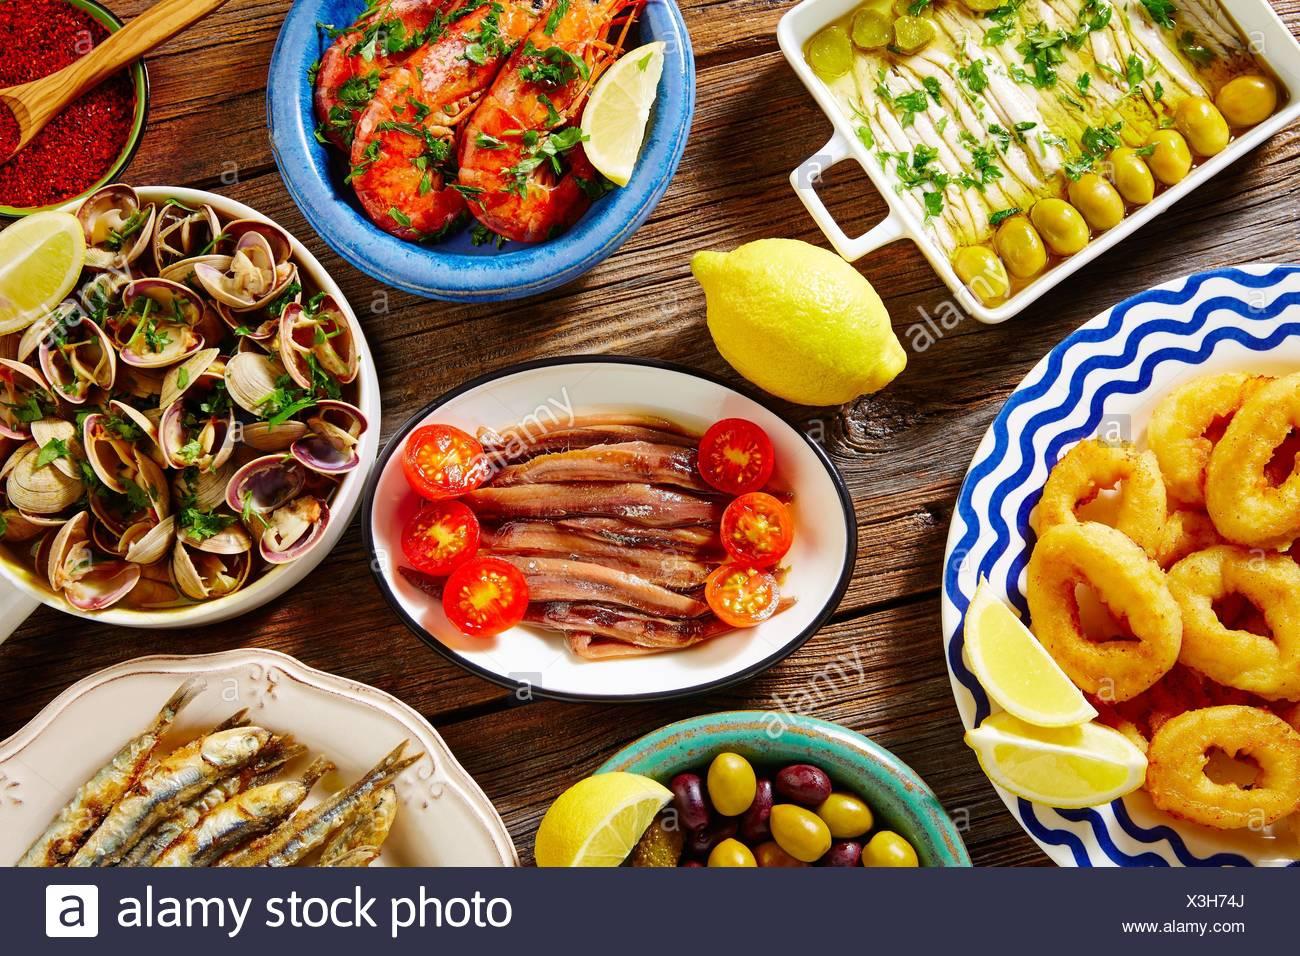 Tapas seafood clams shrimps calamari anchovies shrimps from Spain. - Stock Image